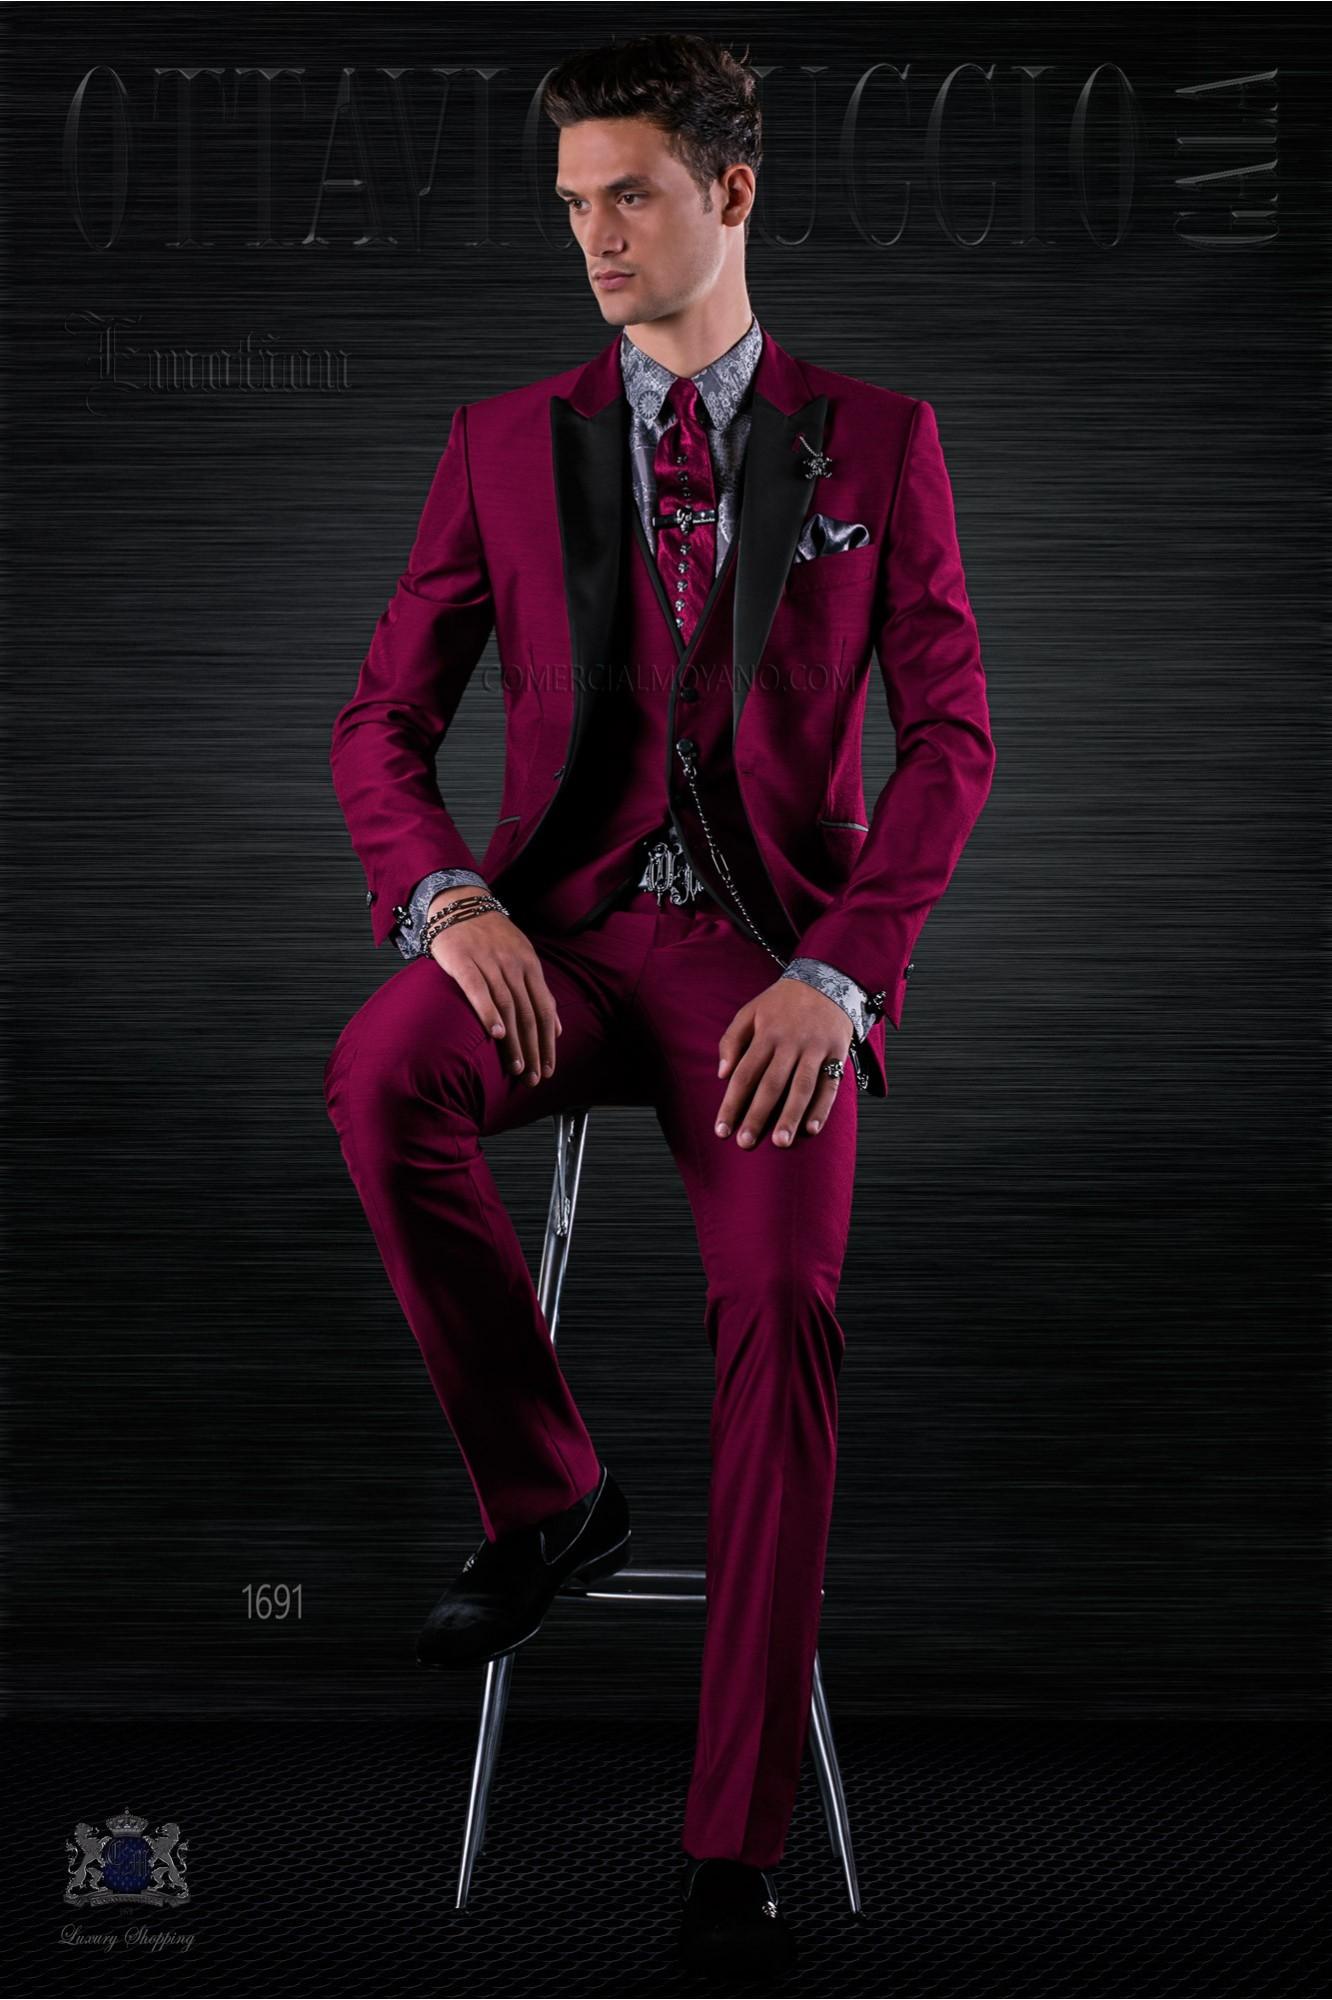 Fashion burgundy italian bespoke suit 3 pieces model 1691 Ottavio Nuccio Gala